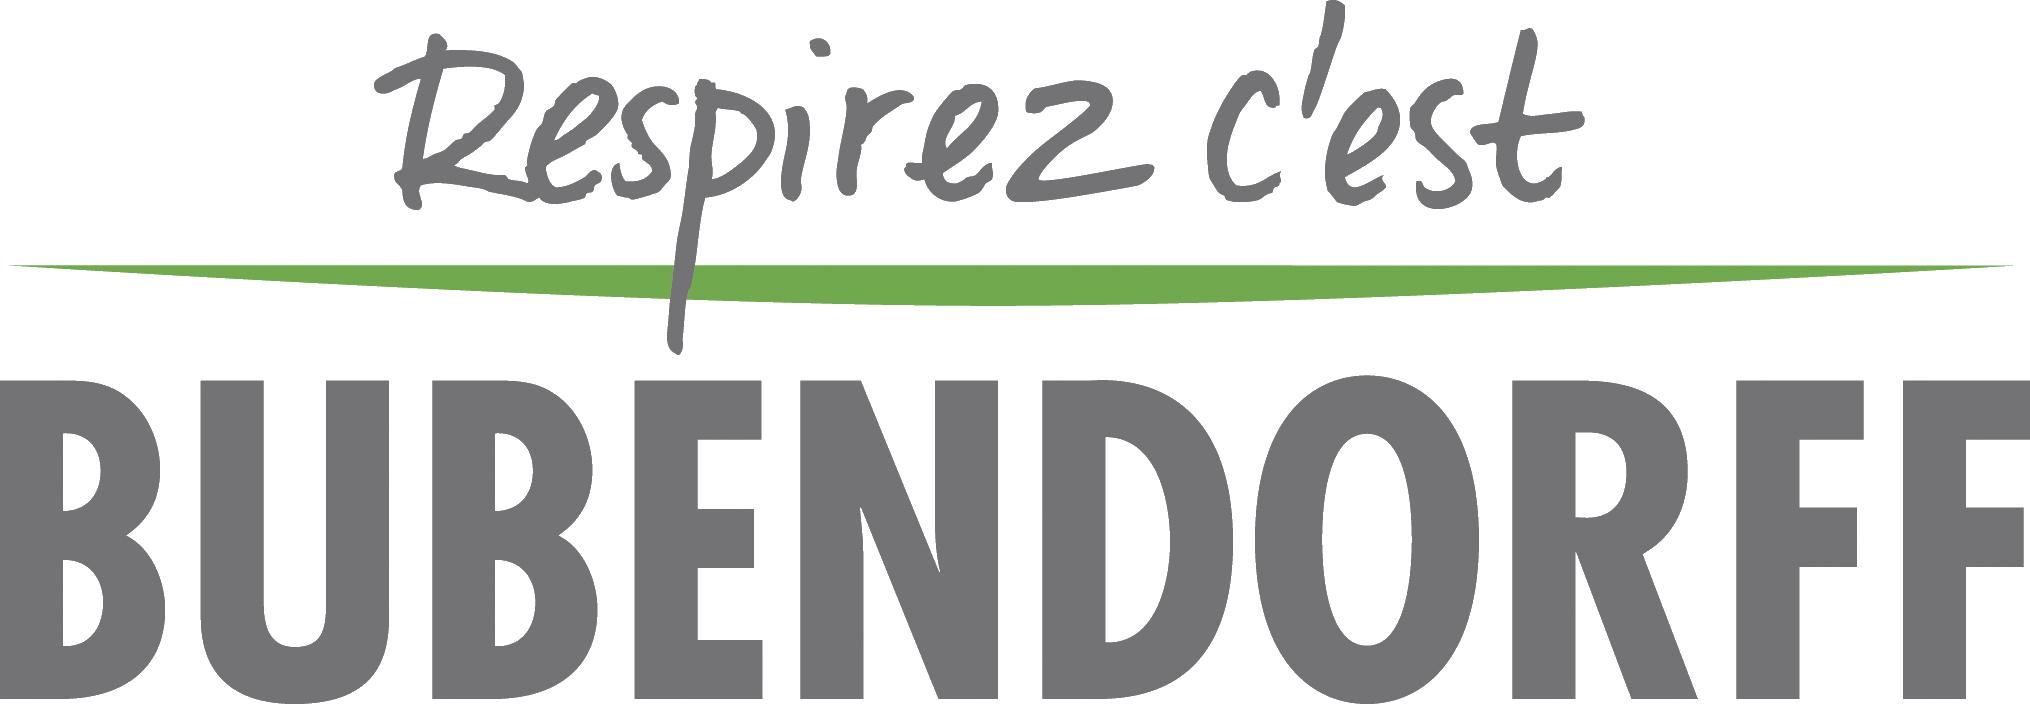 Bubendorff Logo